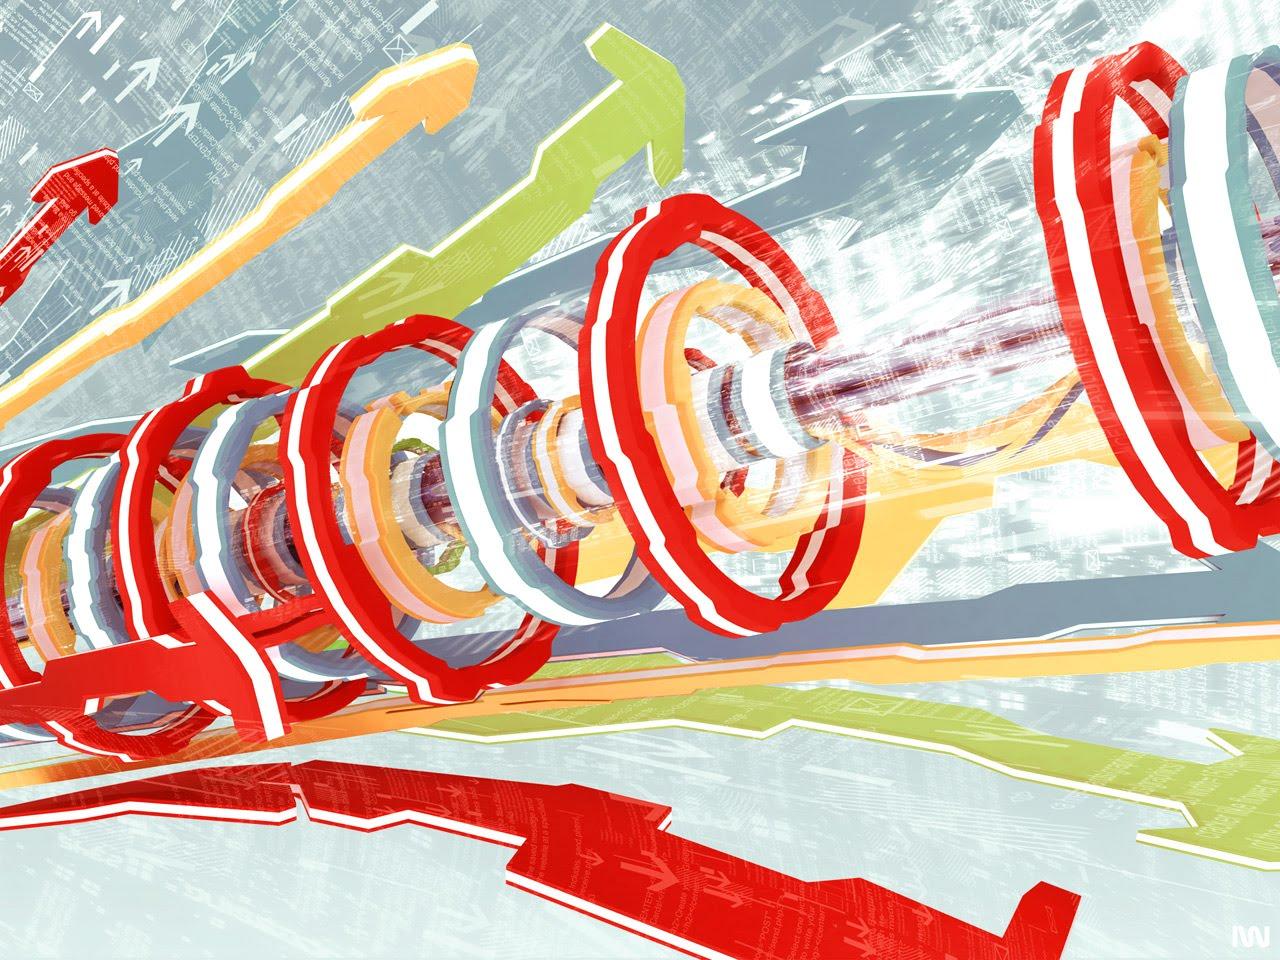 http://1.bp.blogspot.com/_IwbCppTeH0E/TJ0qhqN3SMI/AAAAAAAAAqo/edjz2N4Z5q8/s1600/Digital-Art-Wallpaper-+_33_.jpg